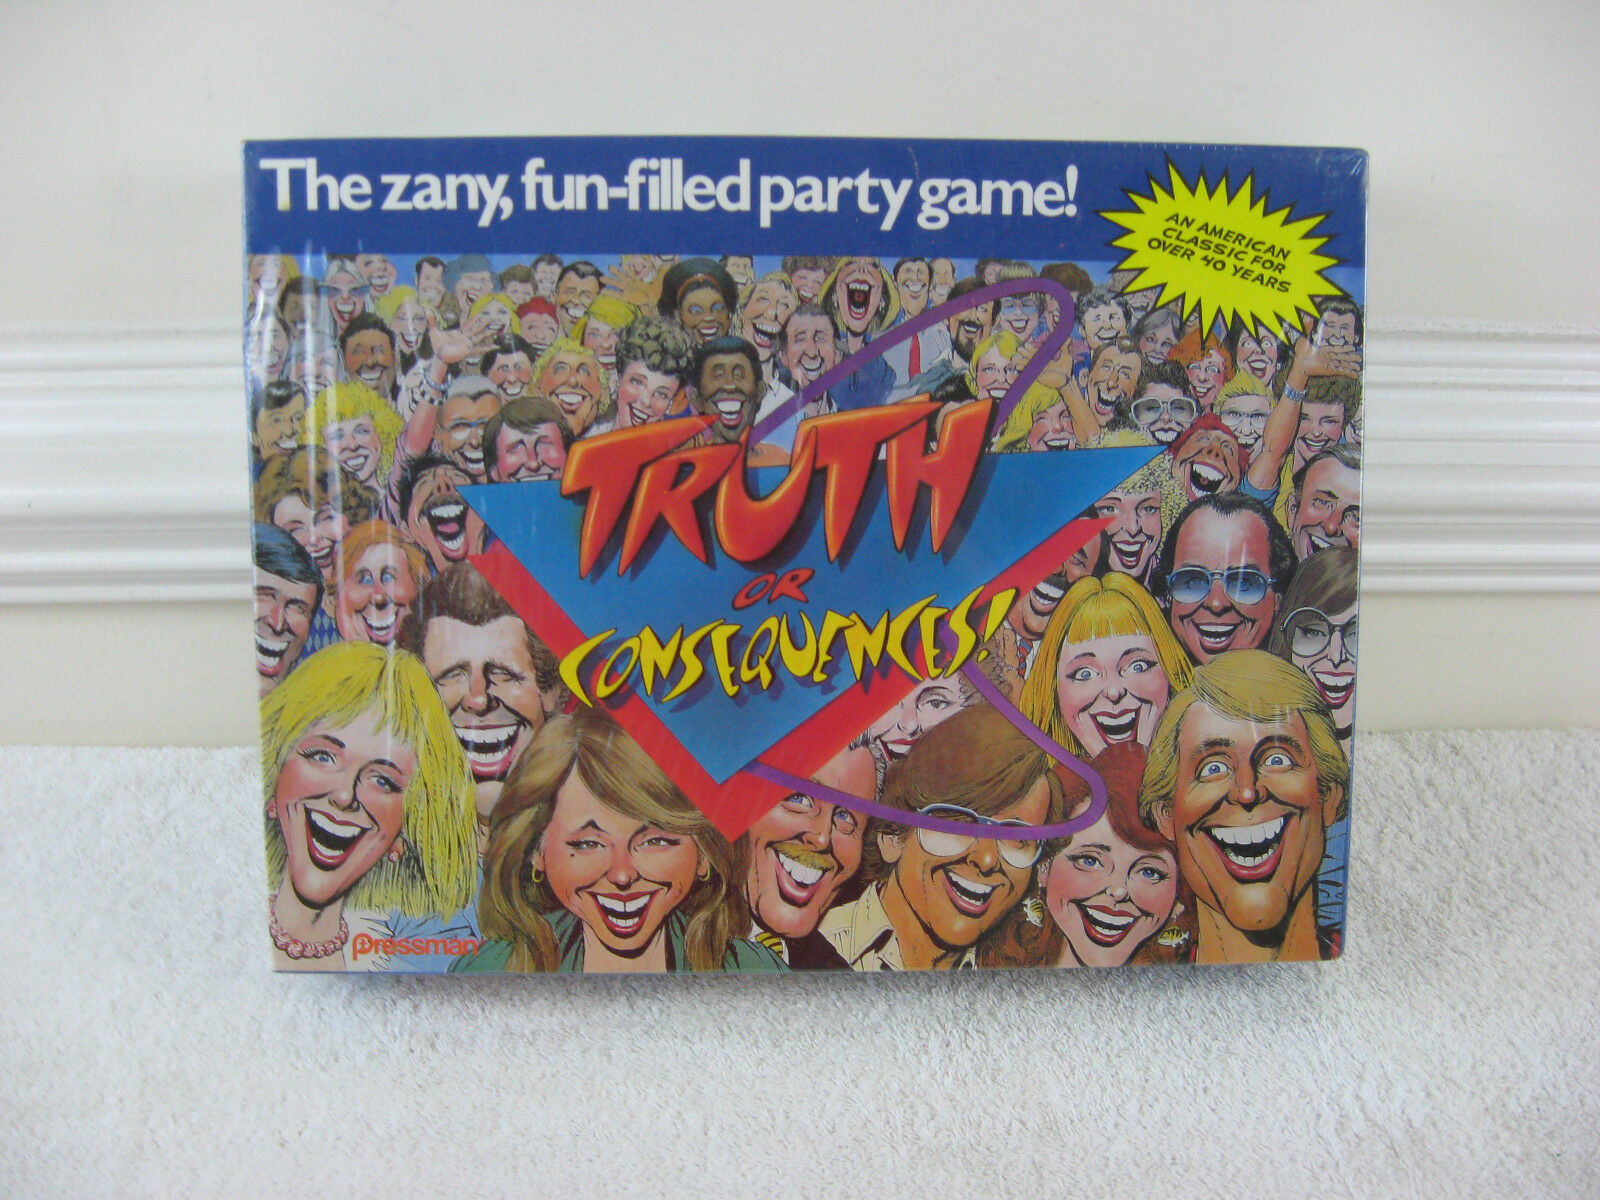 Vintage 1988 Truth or Consequences gioco By PressuomoNOSFactory  Sealed  liquidazione fino al 70%